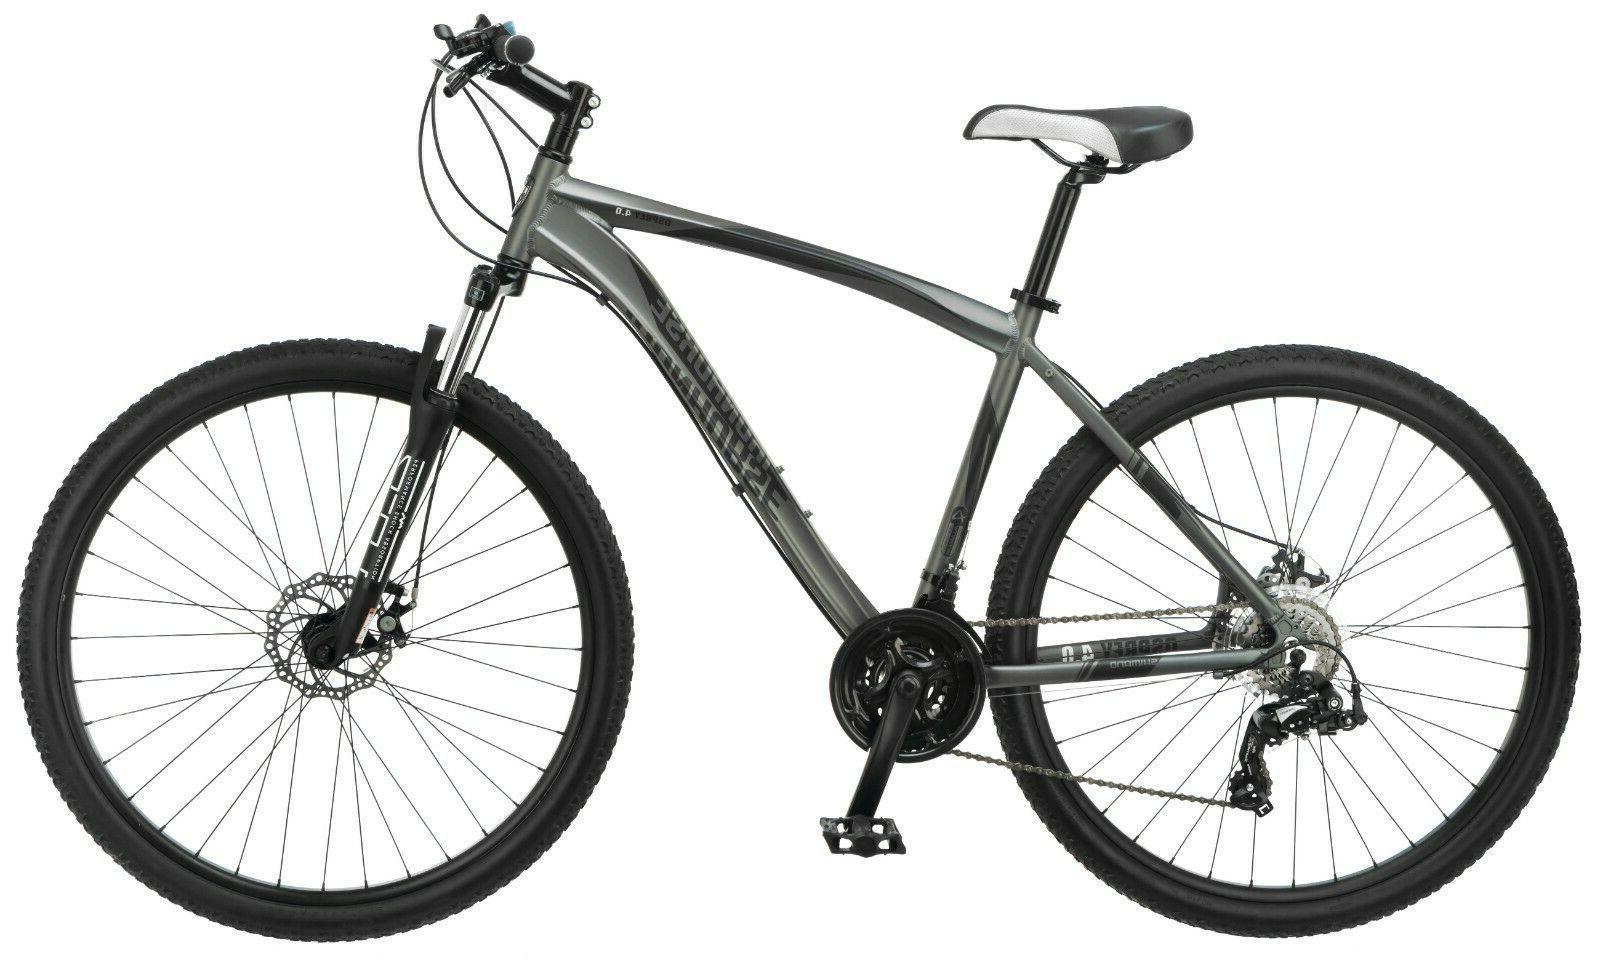 NEW 29-inch Full Suspension Mountain Bike-Gray